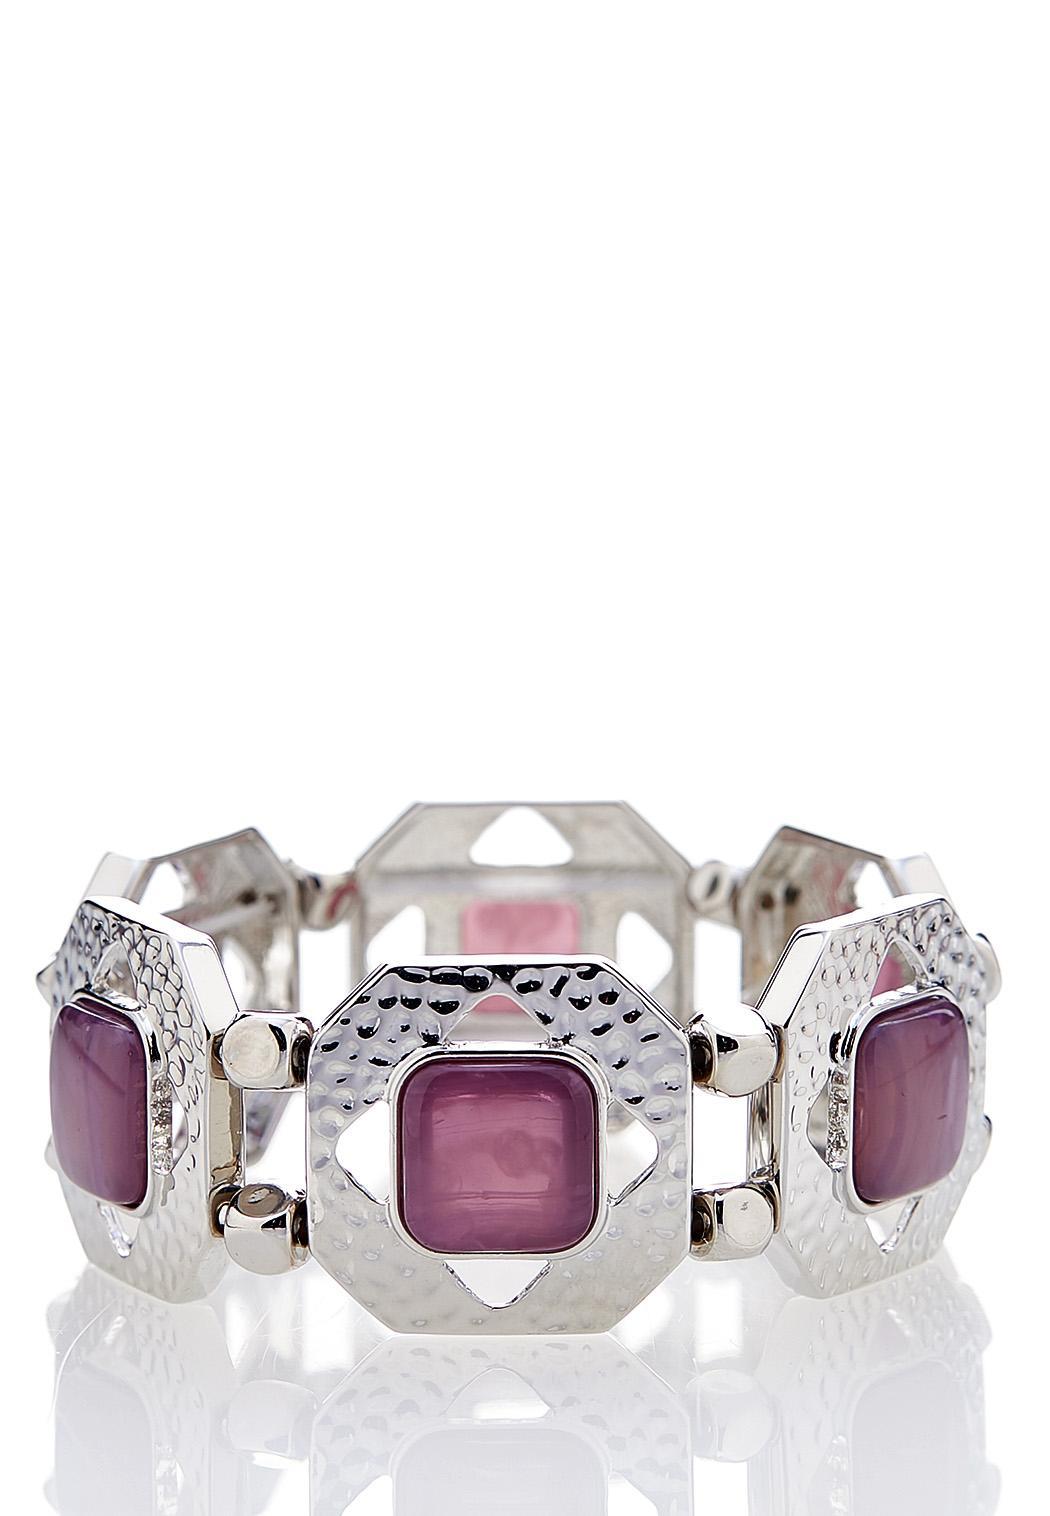 Hammered Acrylic Stretch Bracelet